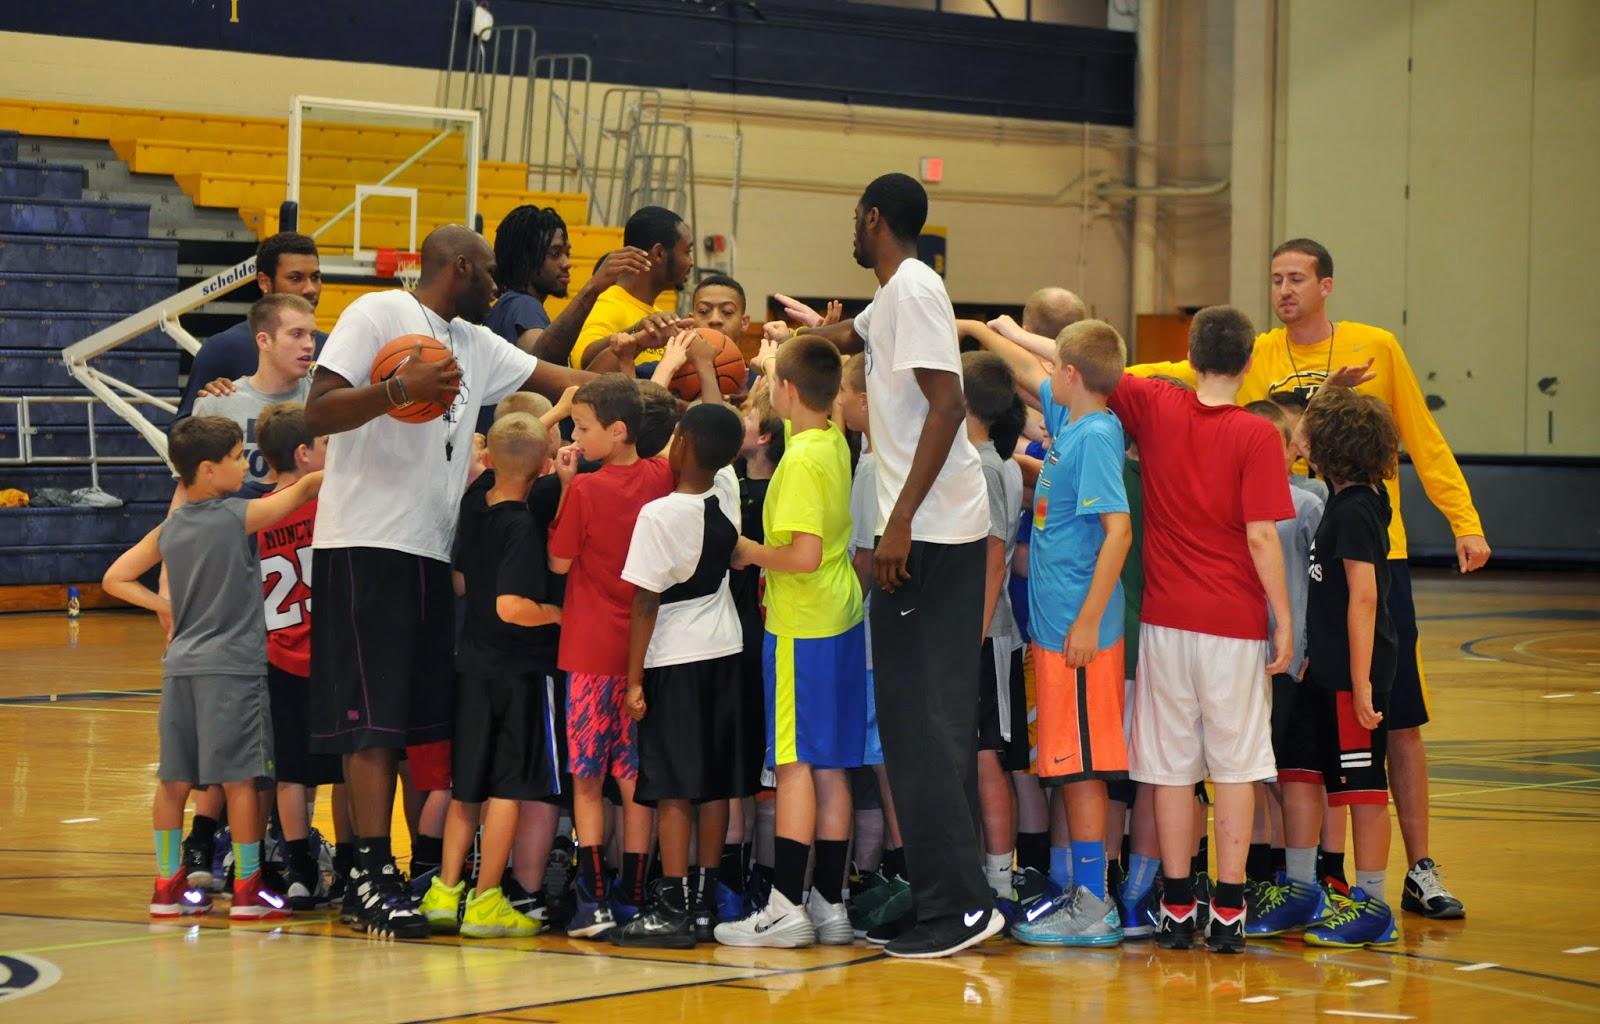 Kent State - Men's Basketball: June 2014